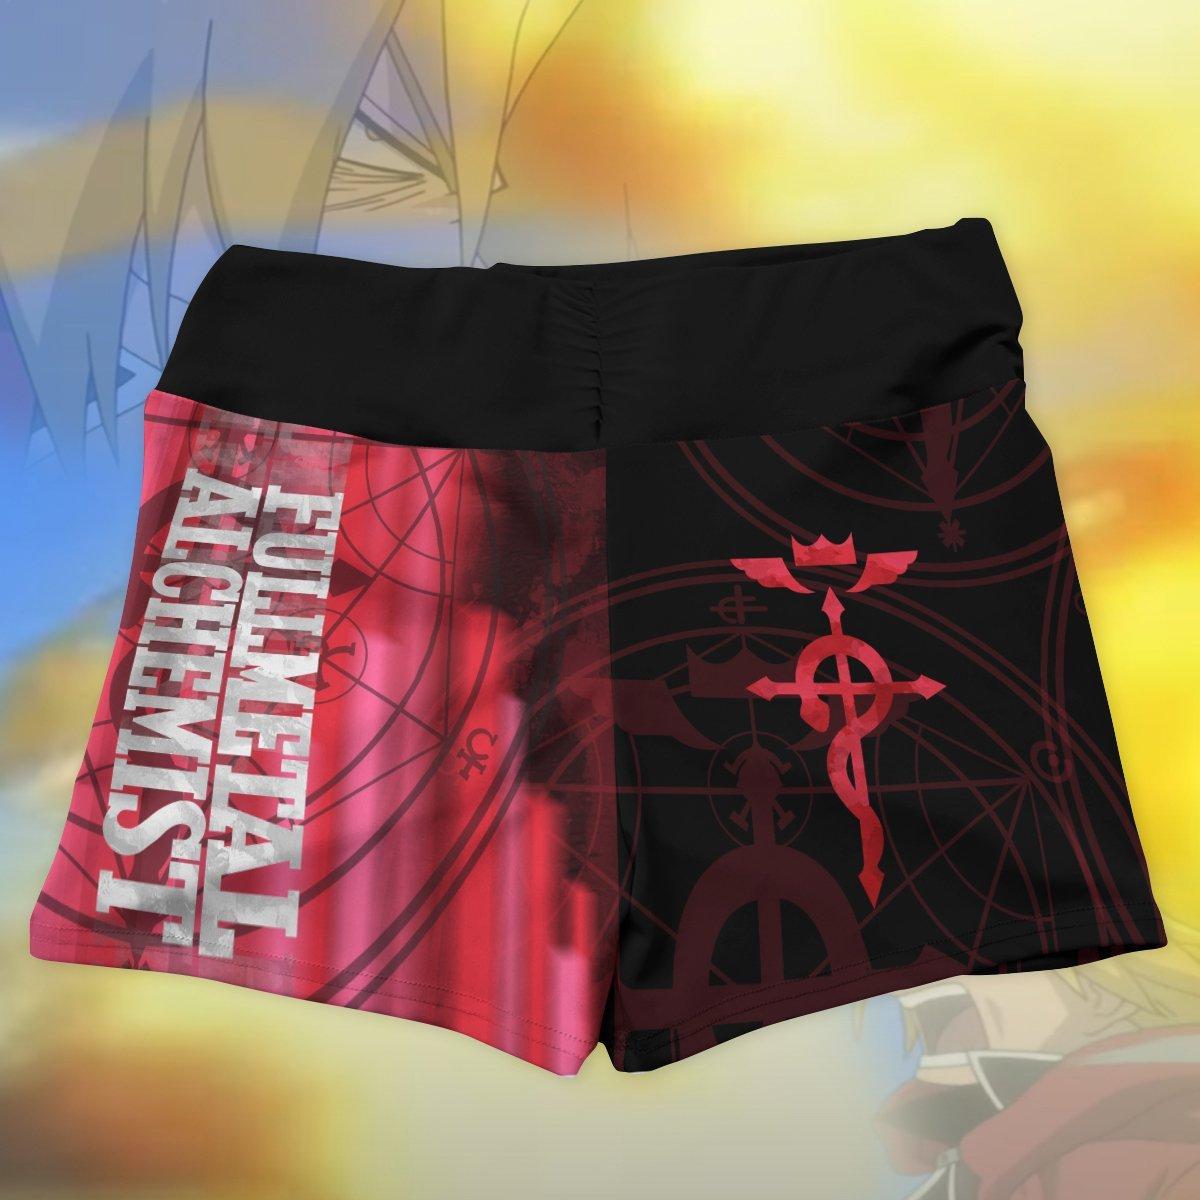 edward summer active wear set 940768 - Anime Swimsuits